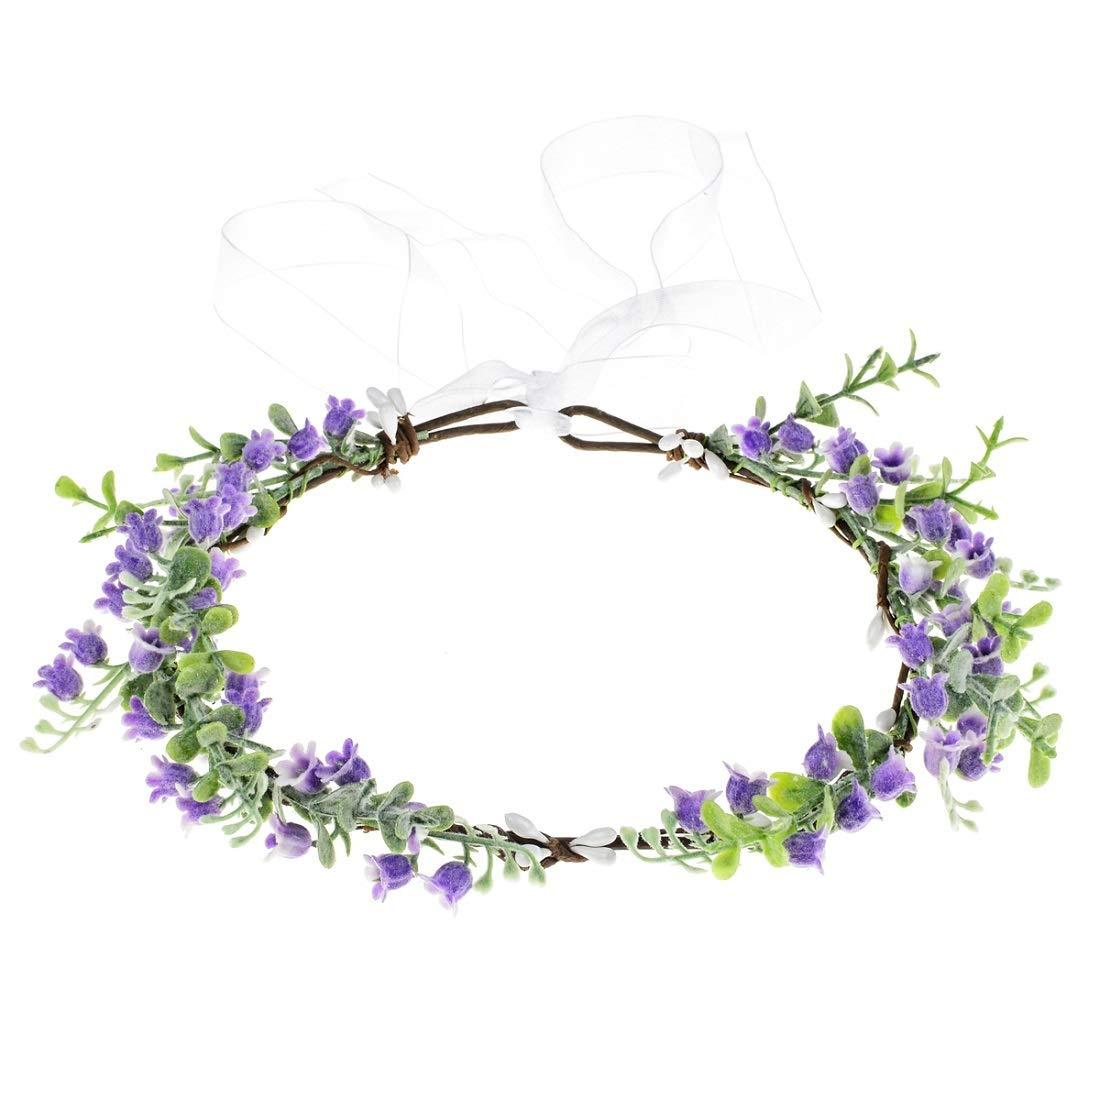 Vividsun Bridal Green Leaf Crown Bohemian Headpiece Floral Headband Photo Prop (purple)